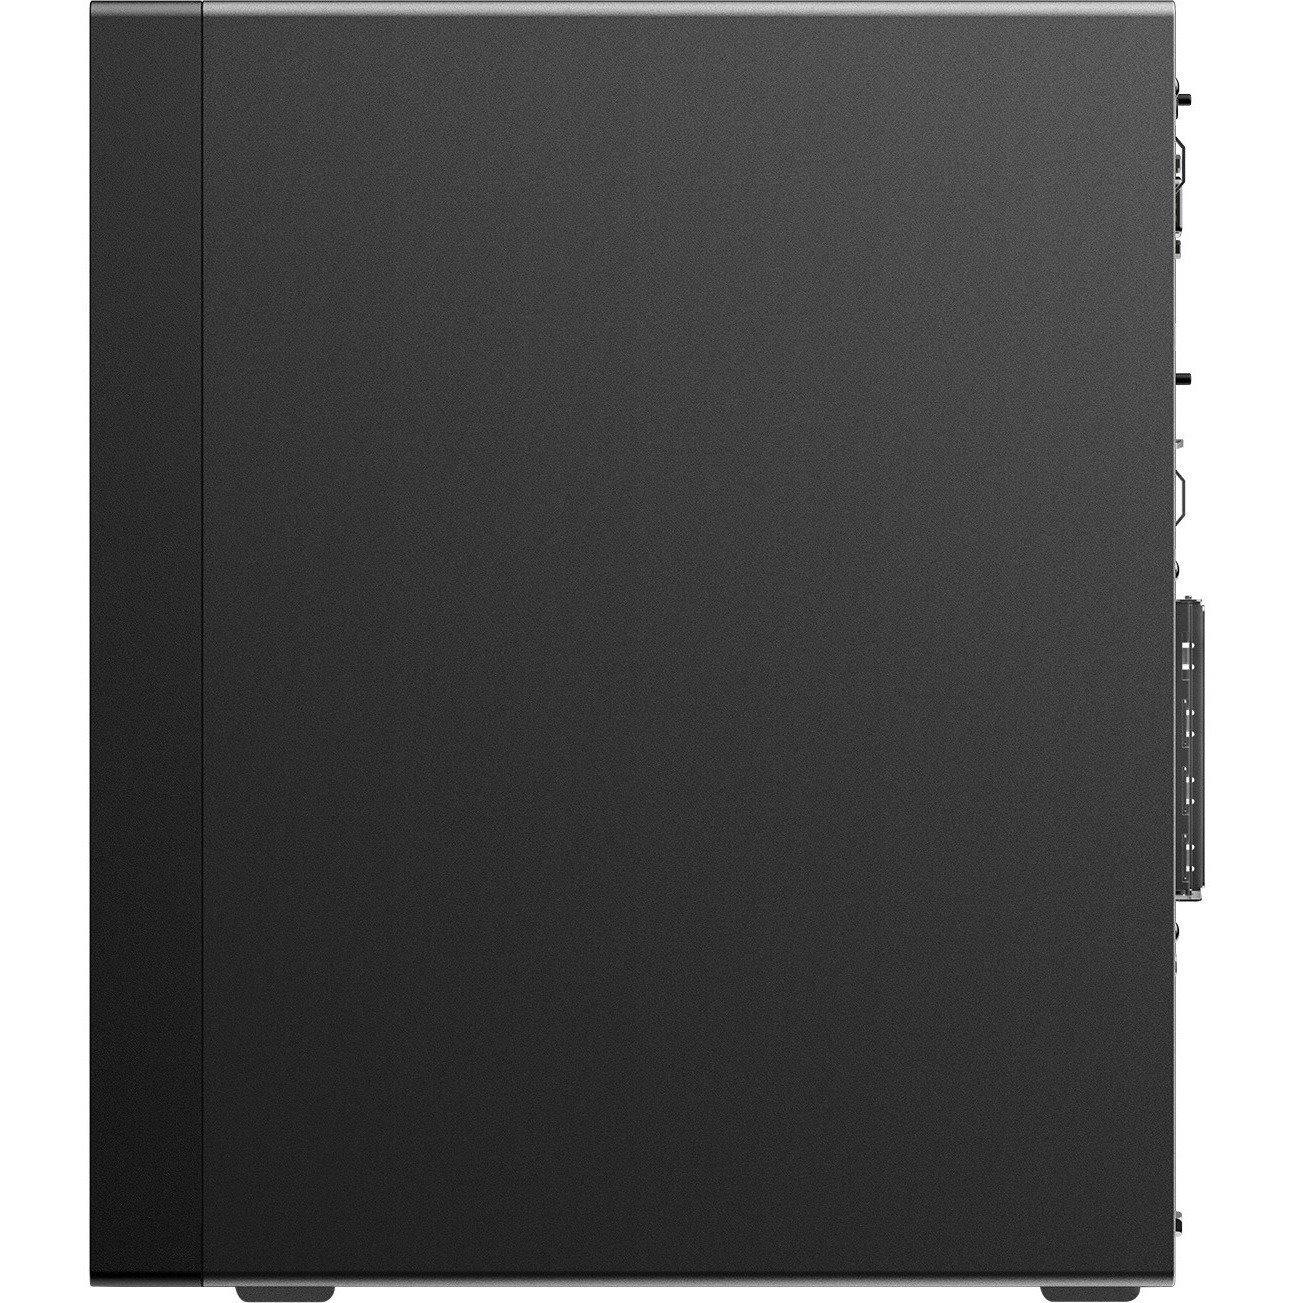 Lenovo ThinkStation P330 30C5S00N00 Workstation - 1 x Intel Xeon E-2124G 3.40 GHz - 16 GB DDR4 SDRAM - 512 GB SSDNVIDIA Quadro P400 2 GB Graphics - Windows 10 Pro for Workstations 64-bit - Tower